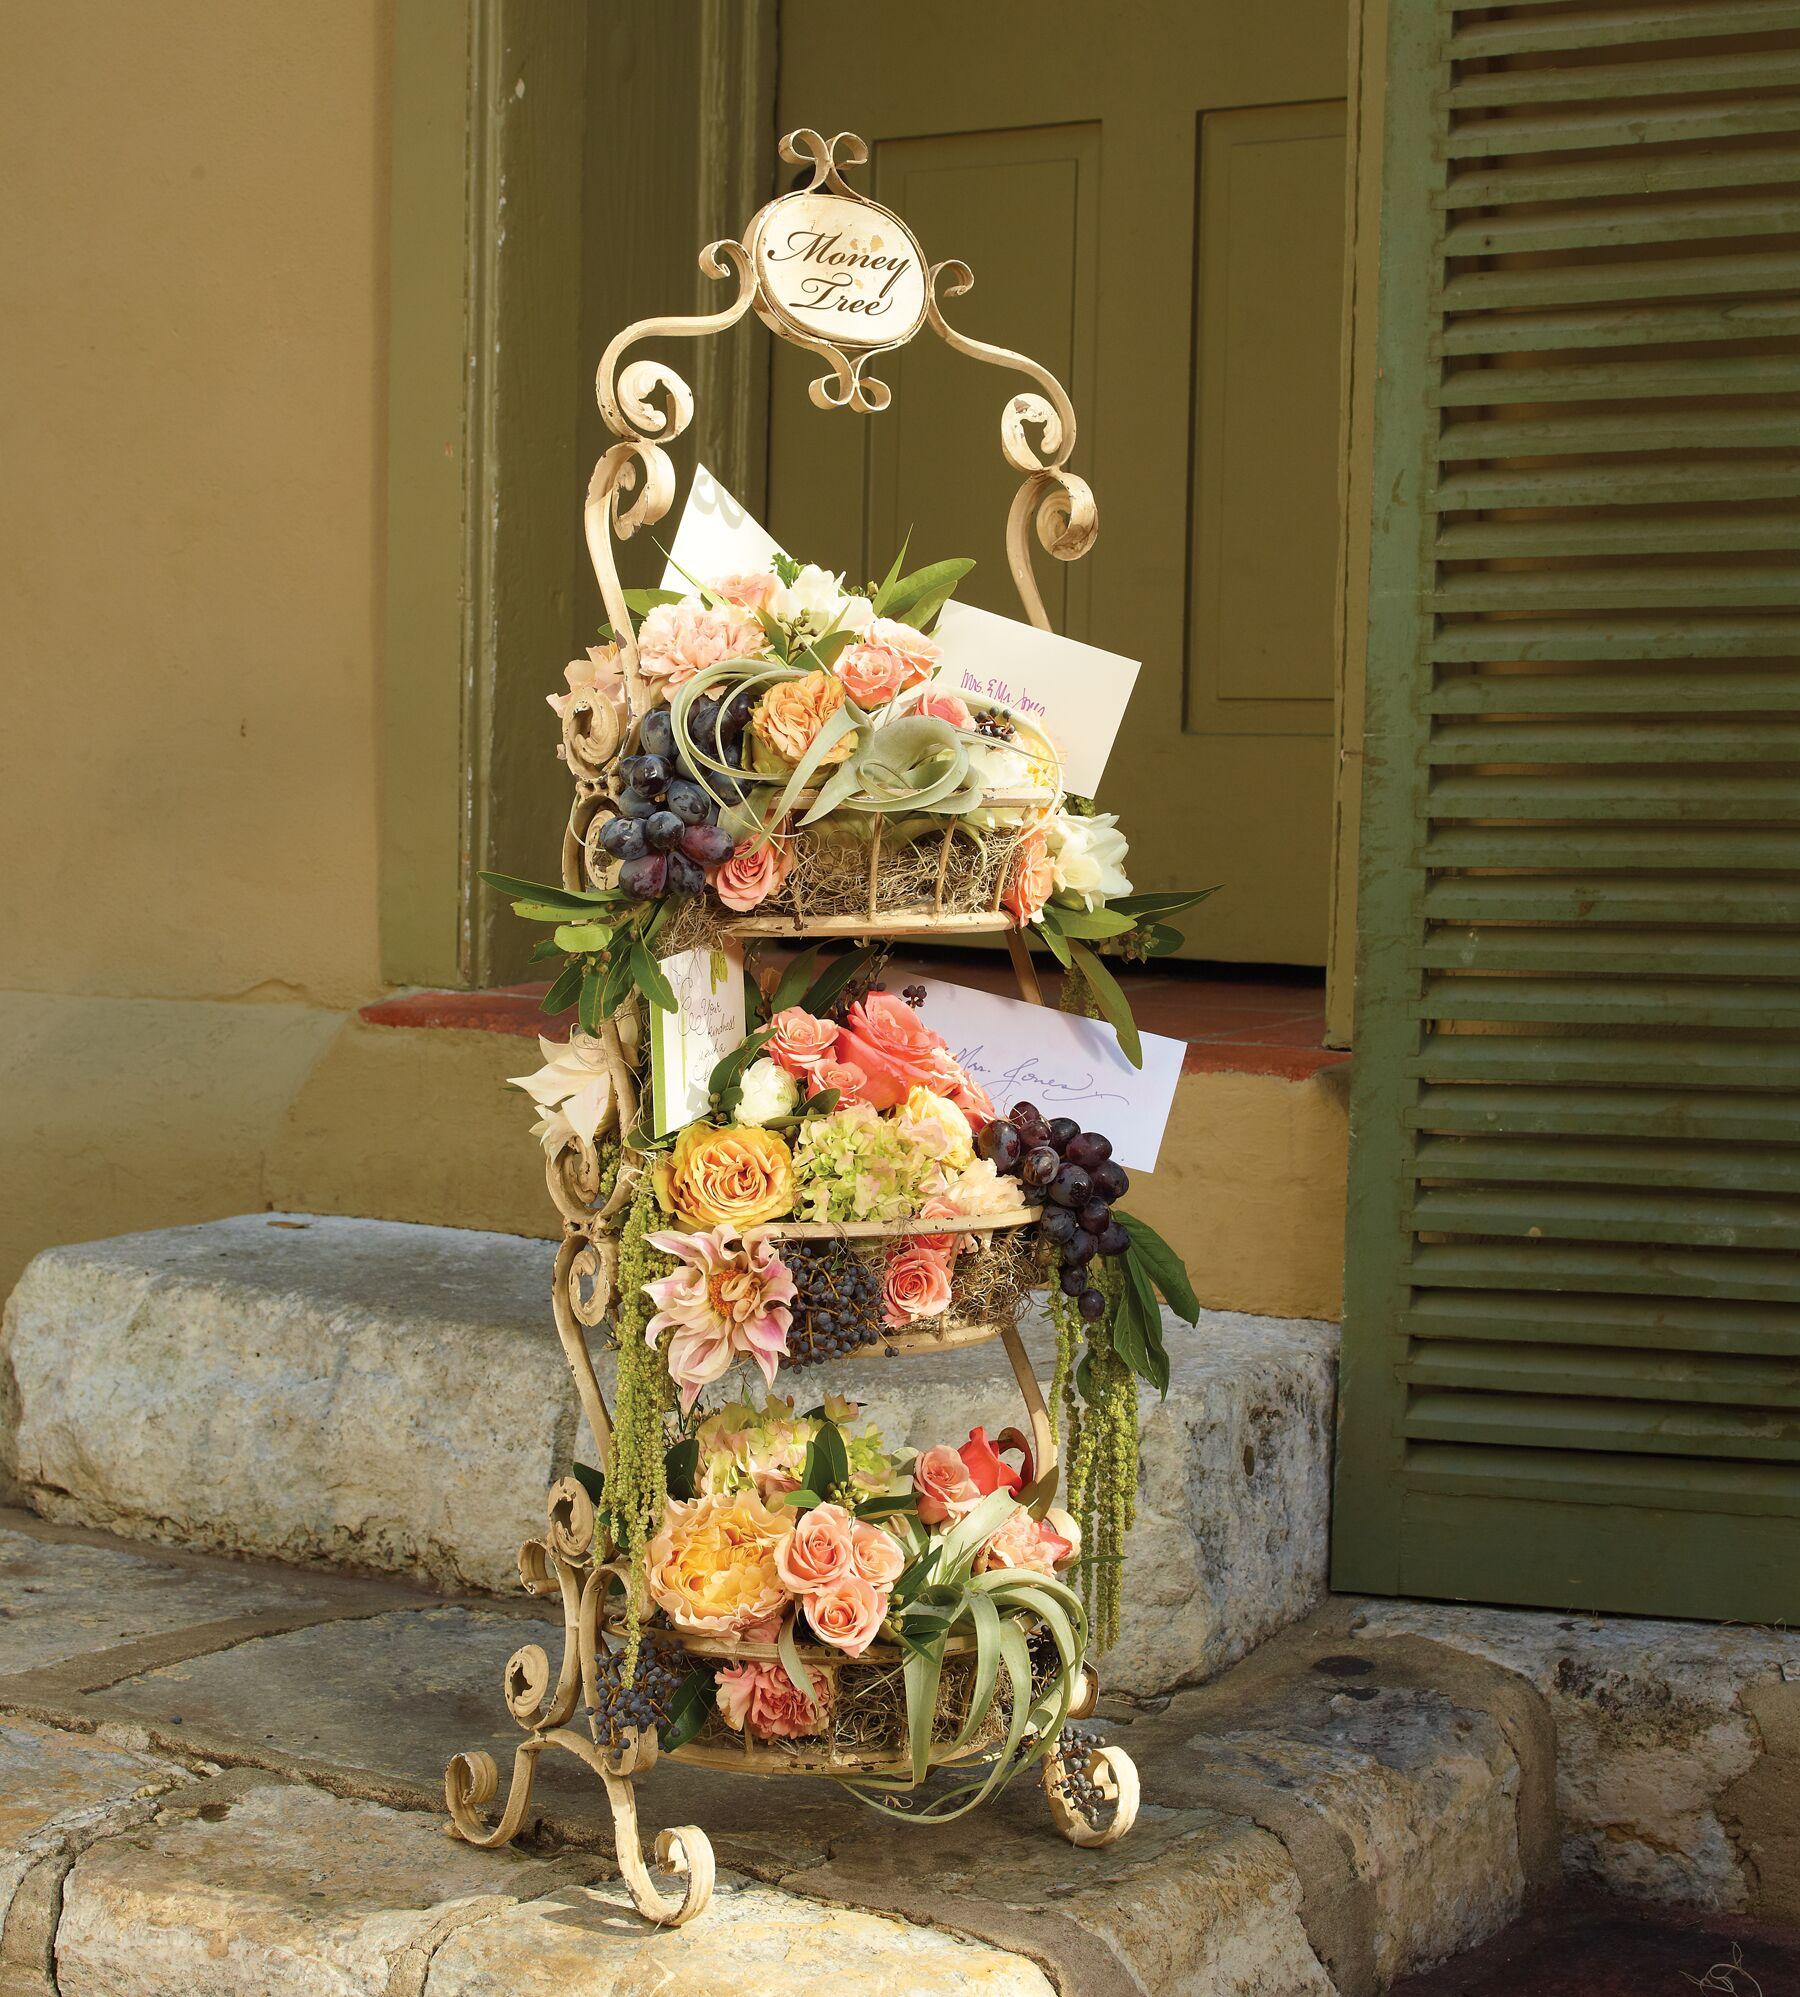 h-e-b blooms | florists - san antonio, tx